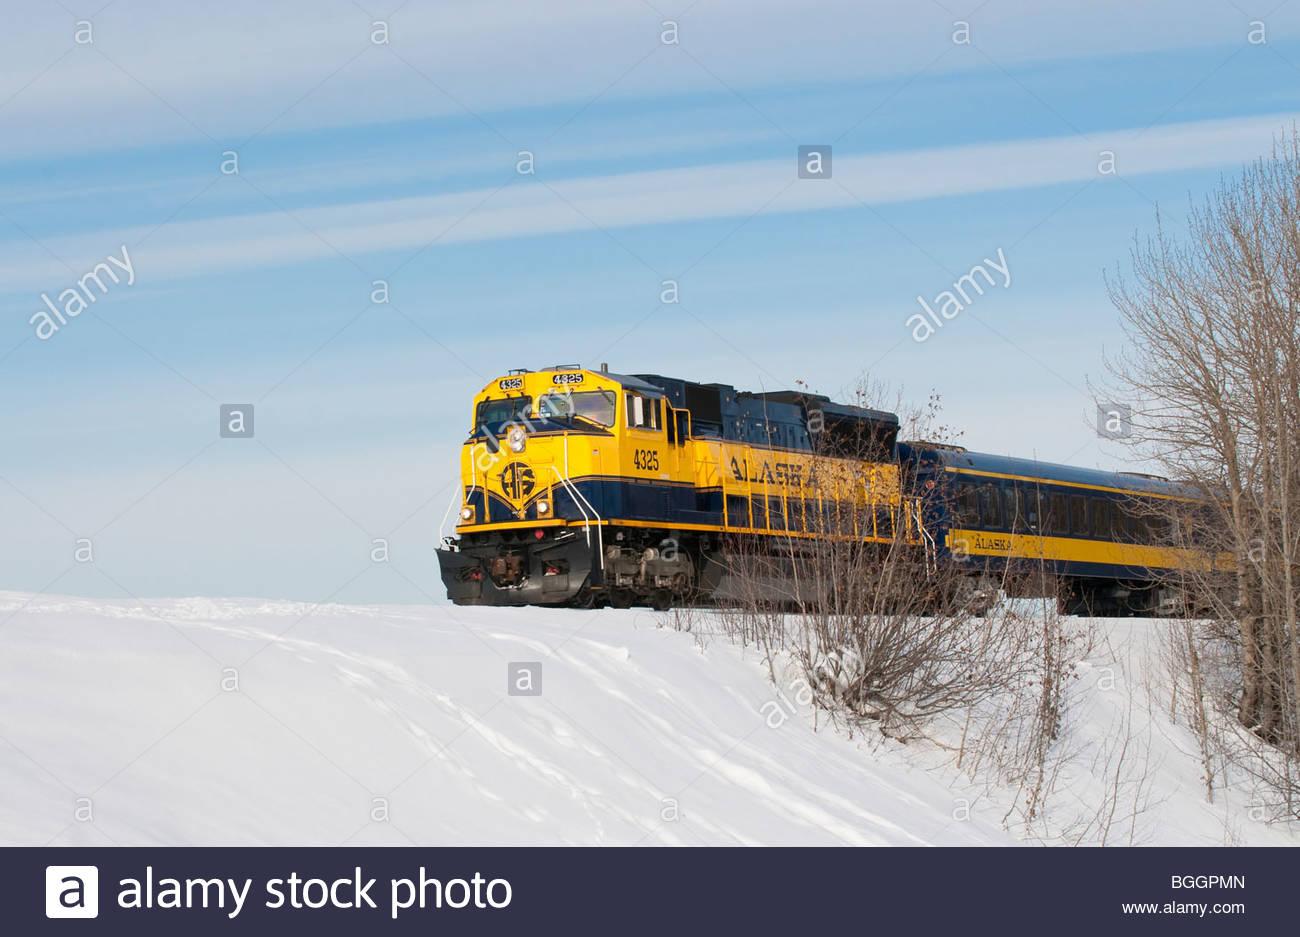 AKRR, Alaska, Alaska Railroad train engine in winter - Stock Image